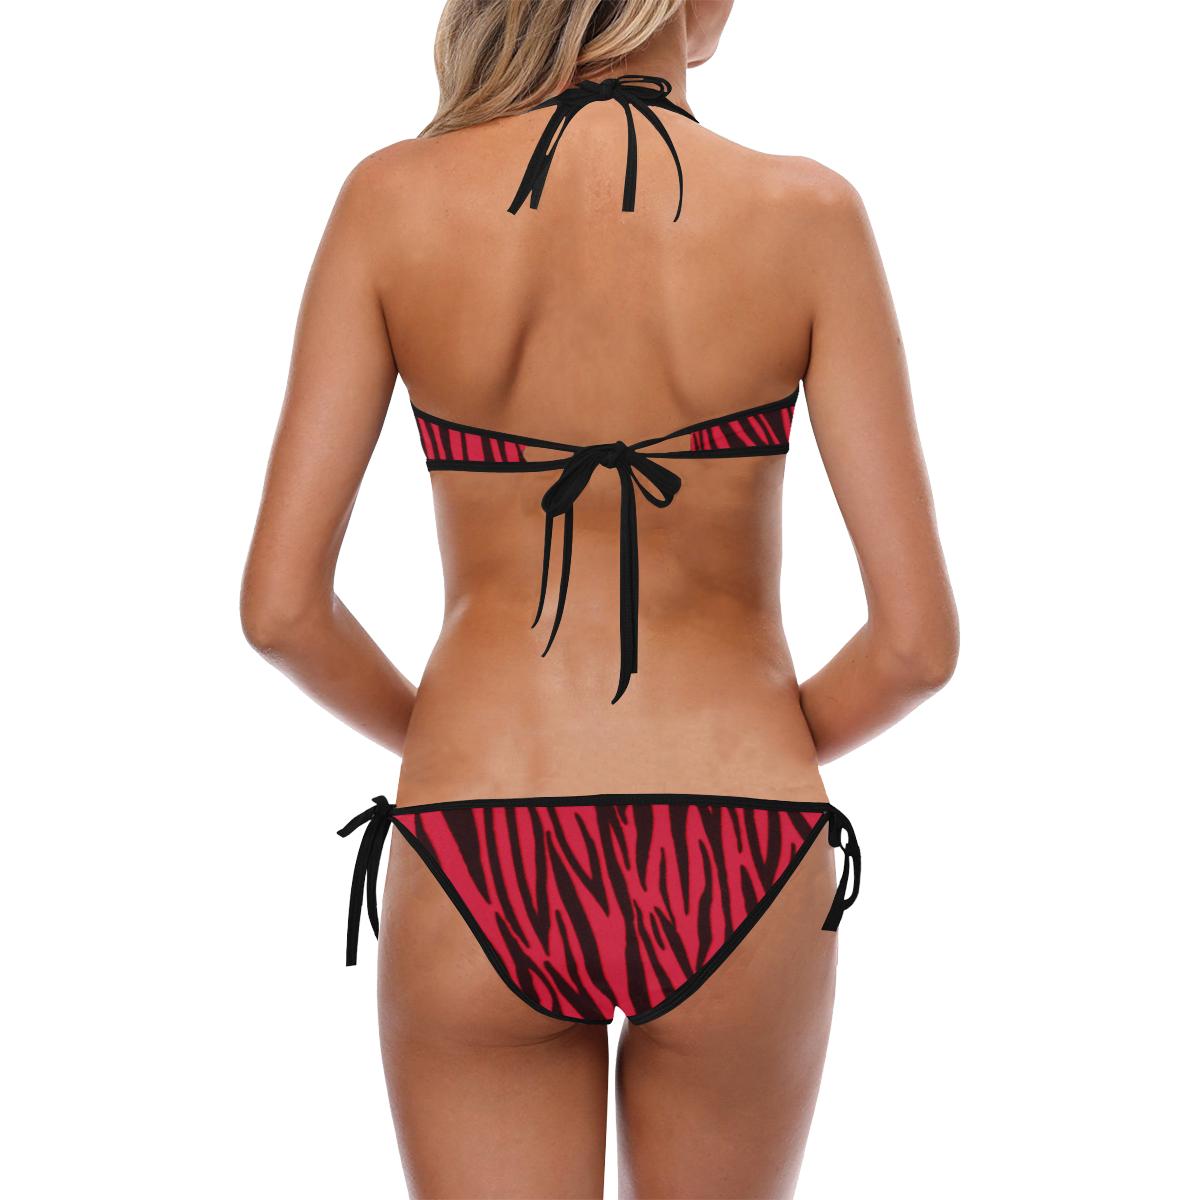 Red Zebra Pattern Custom Halter & Side Tie Bikini Swimsuit (Model S06)